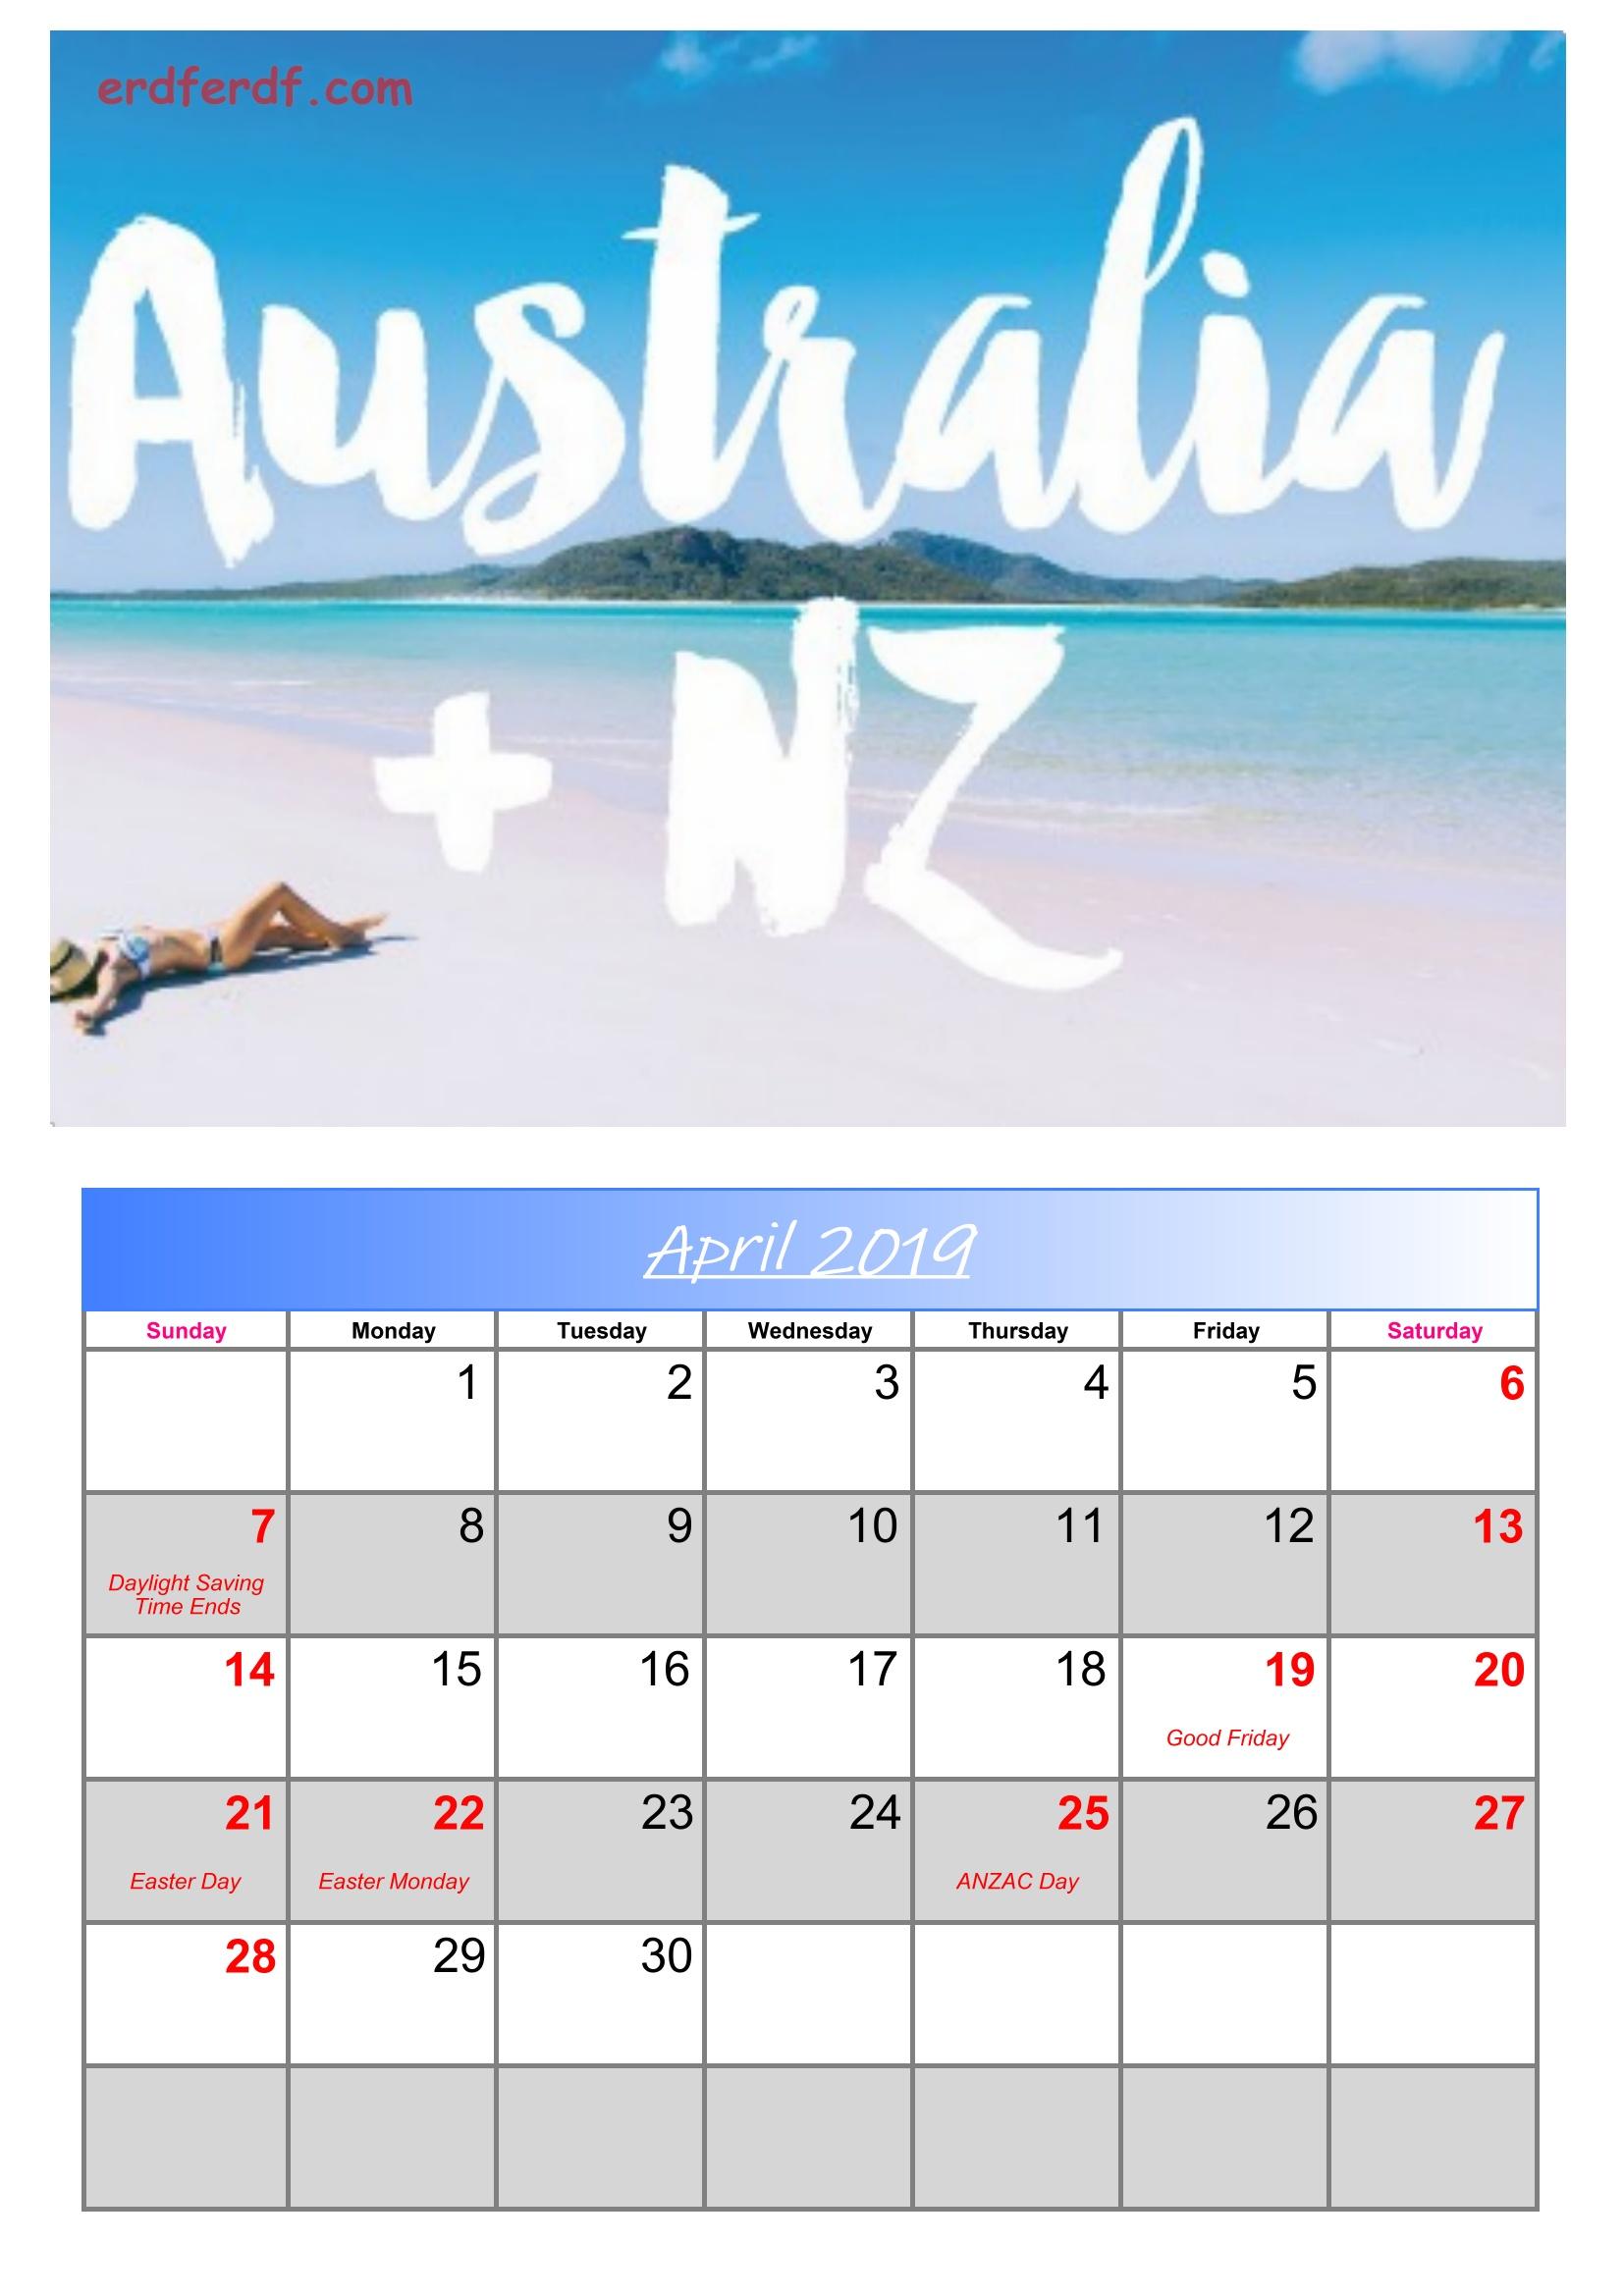 4 Arpil Australia Calendar 2019 With Holidays